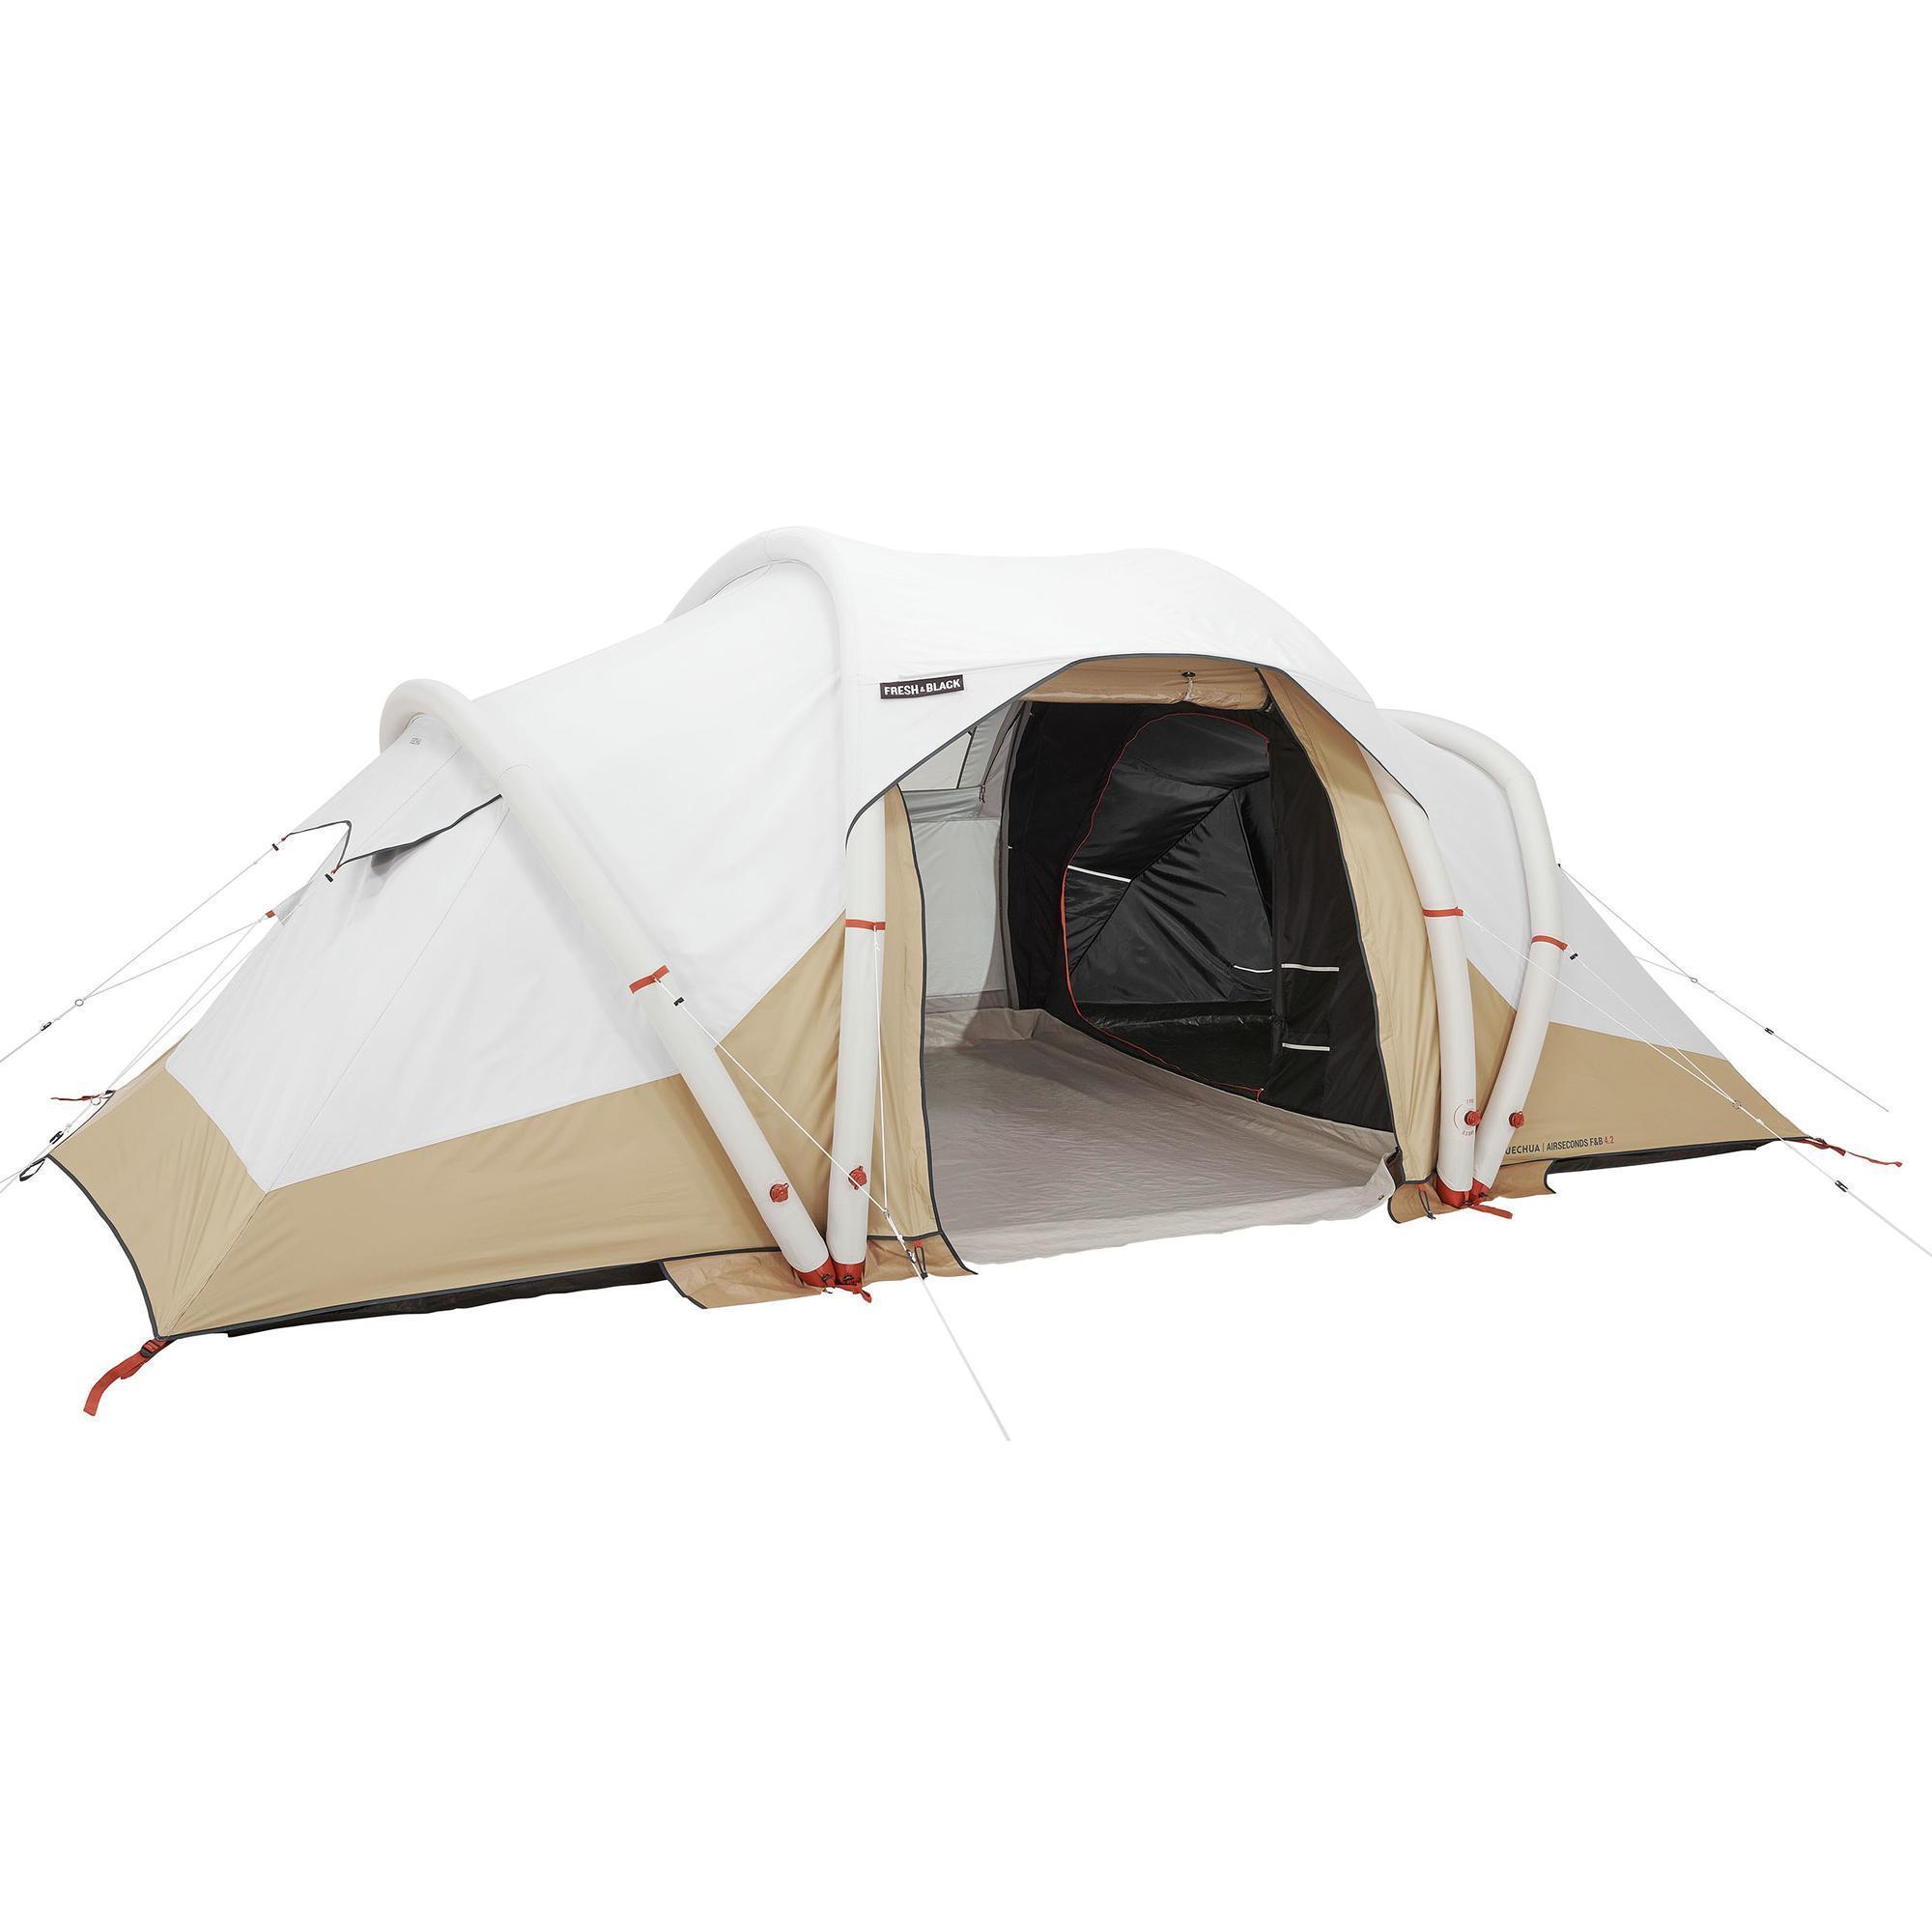 camping decathlon